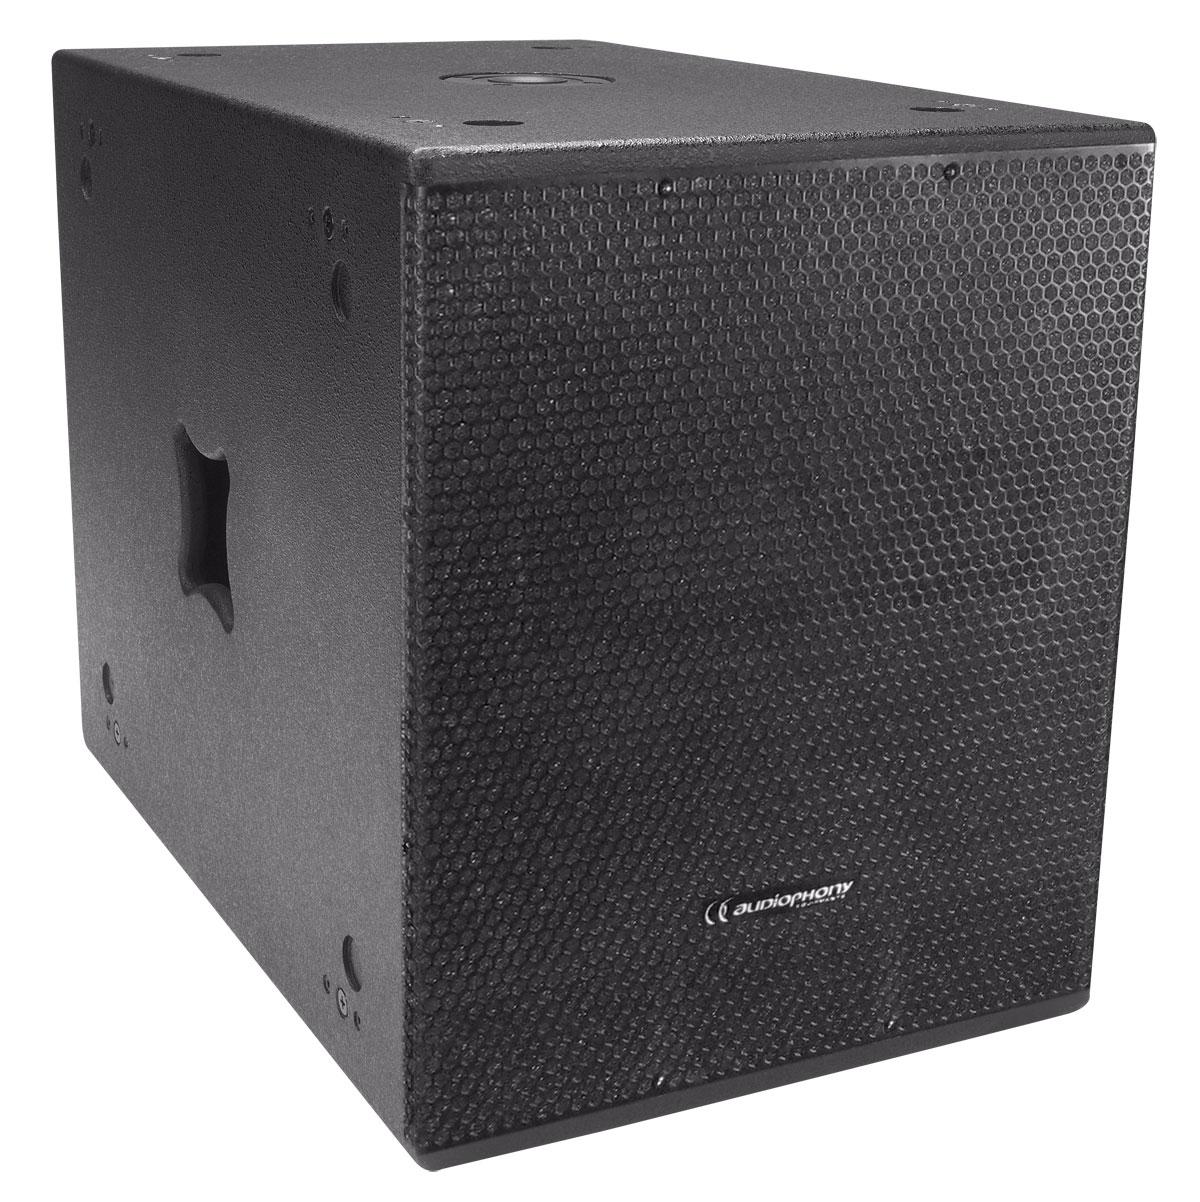 Audiophony - SUB115-AMP